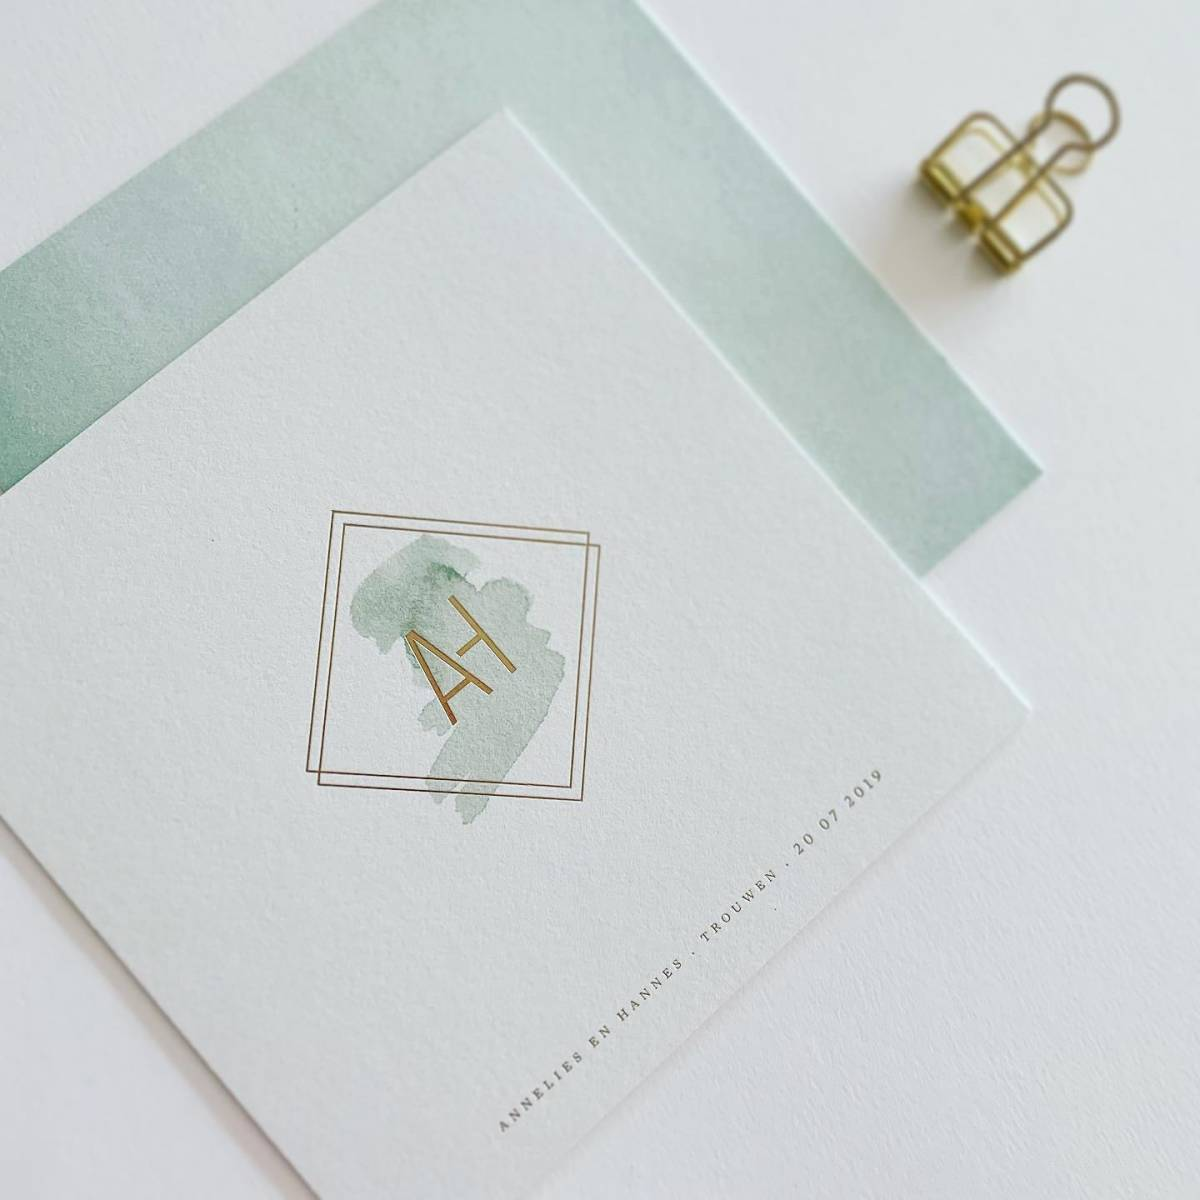 Scarabar - Trouwuitnodiging - Huwelijksuitnodiging - Drukwerk - Huwelijk - Trouw - Bruiloft - House of Weddings - 1